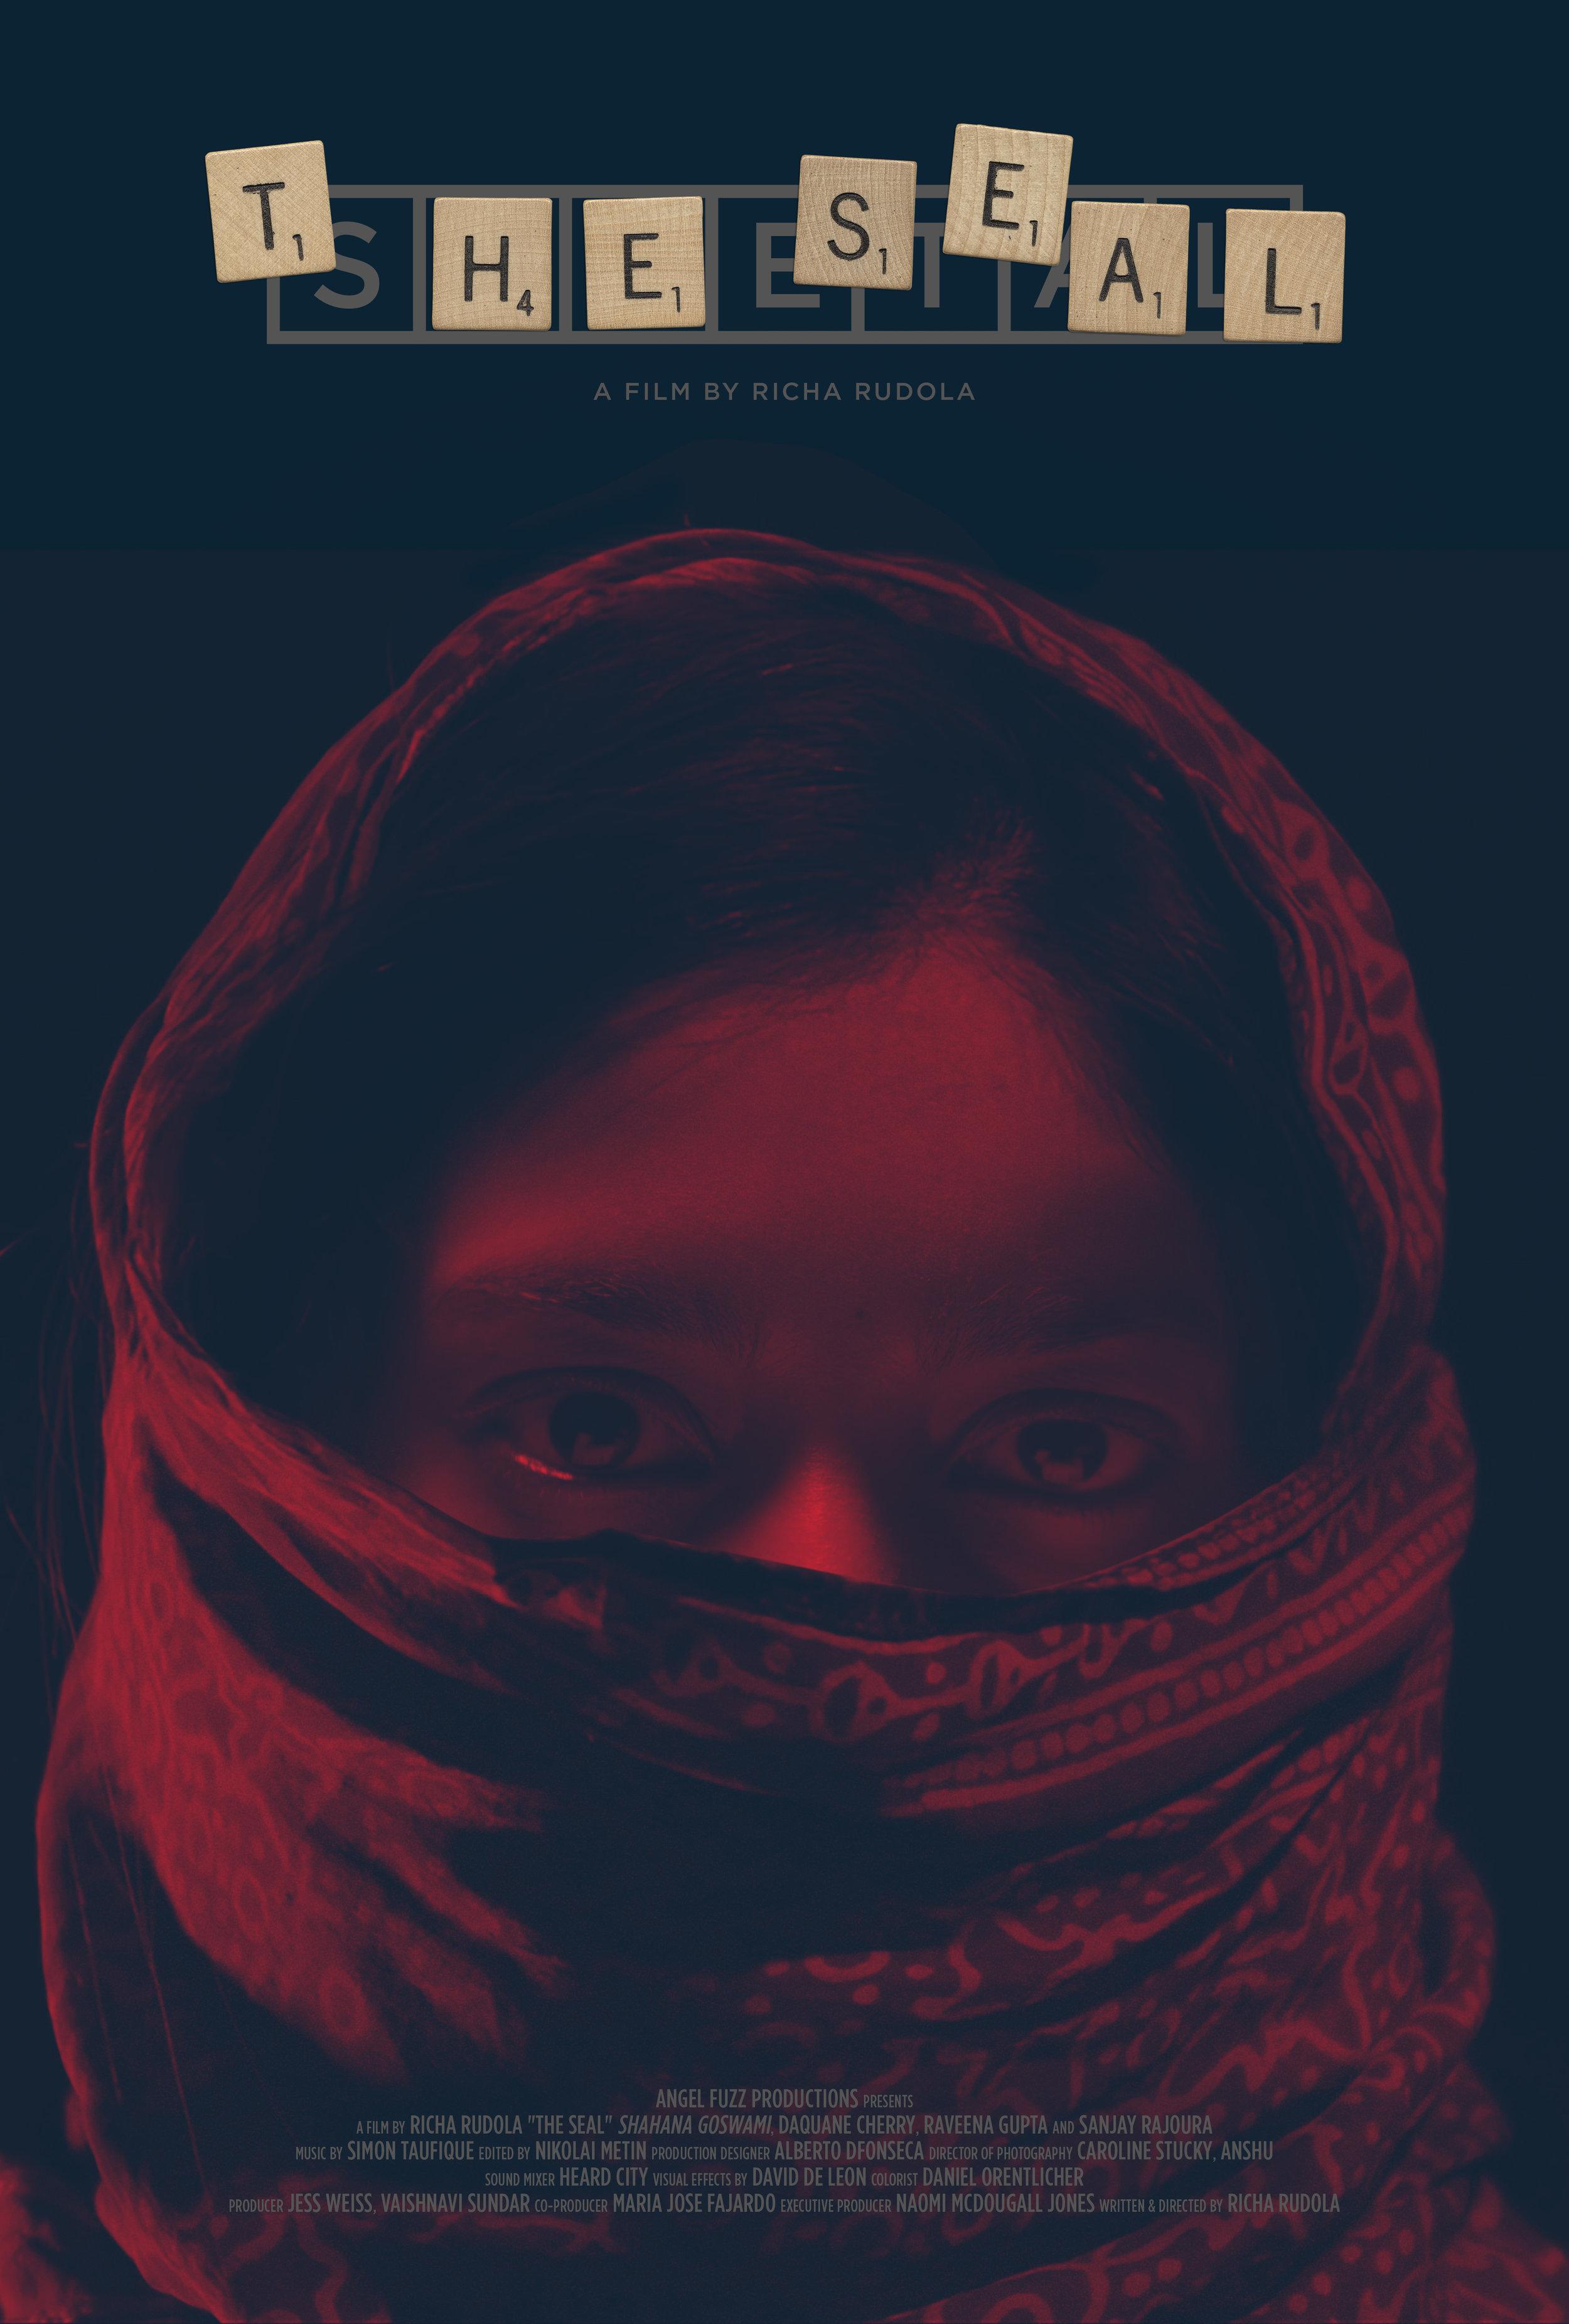 THE SEAL / Dir: Richa Rudola  Starring Shahana Goswami / In festivals